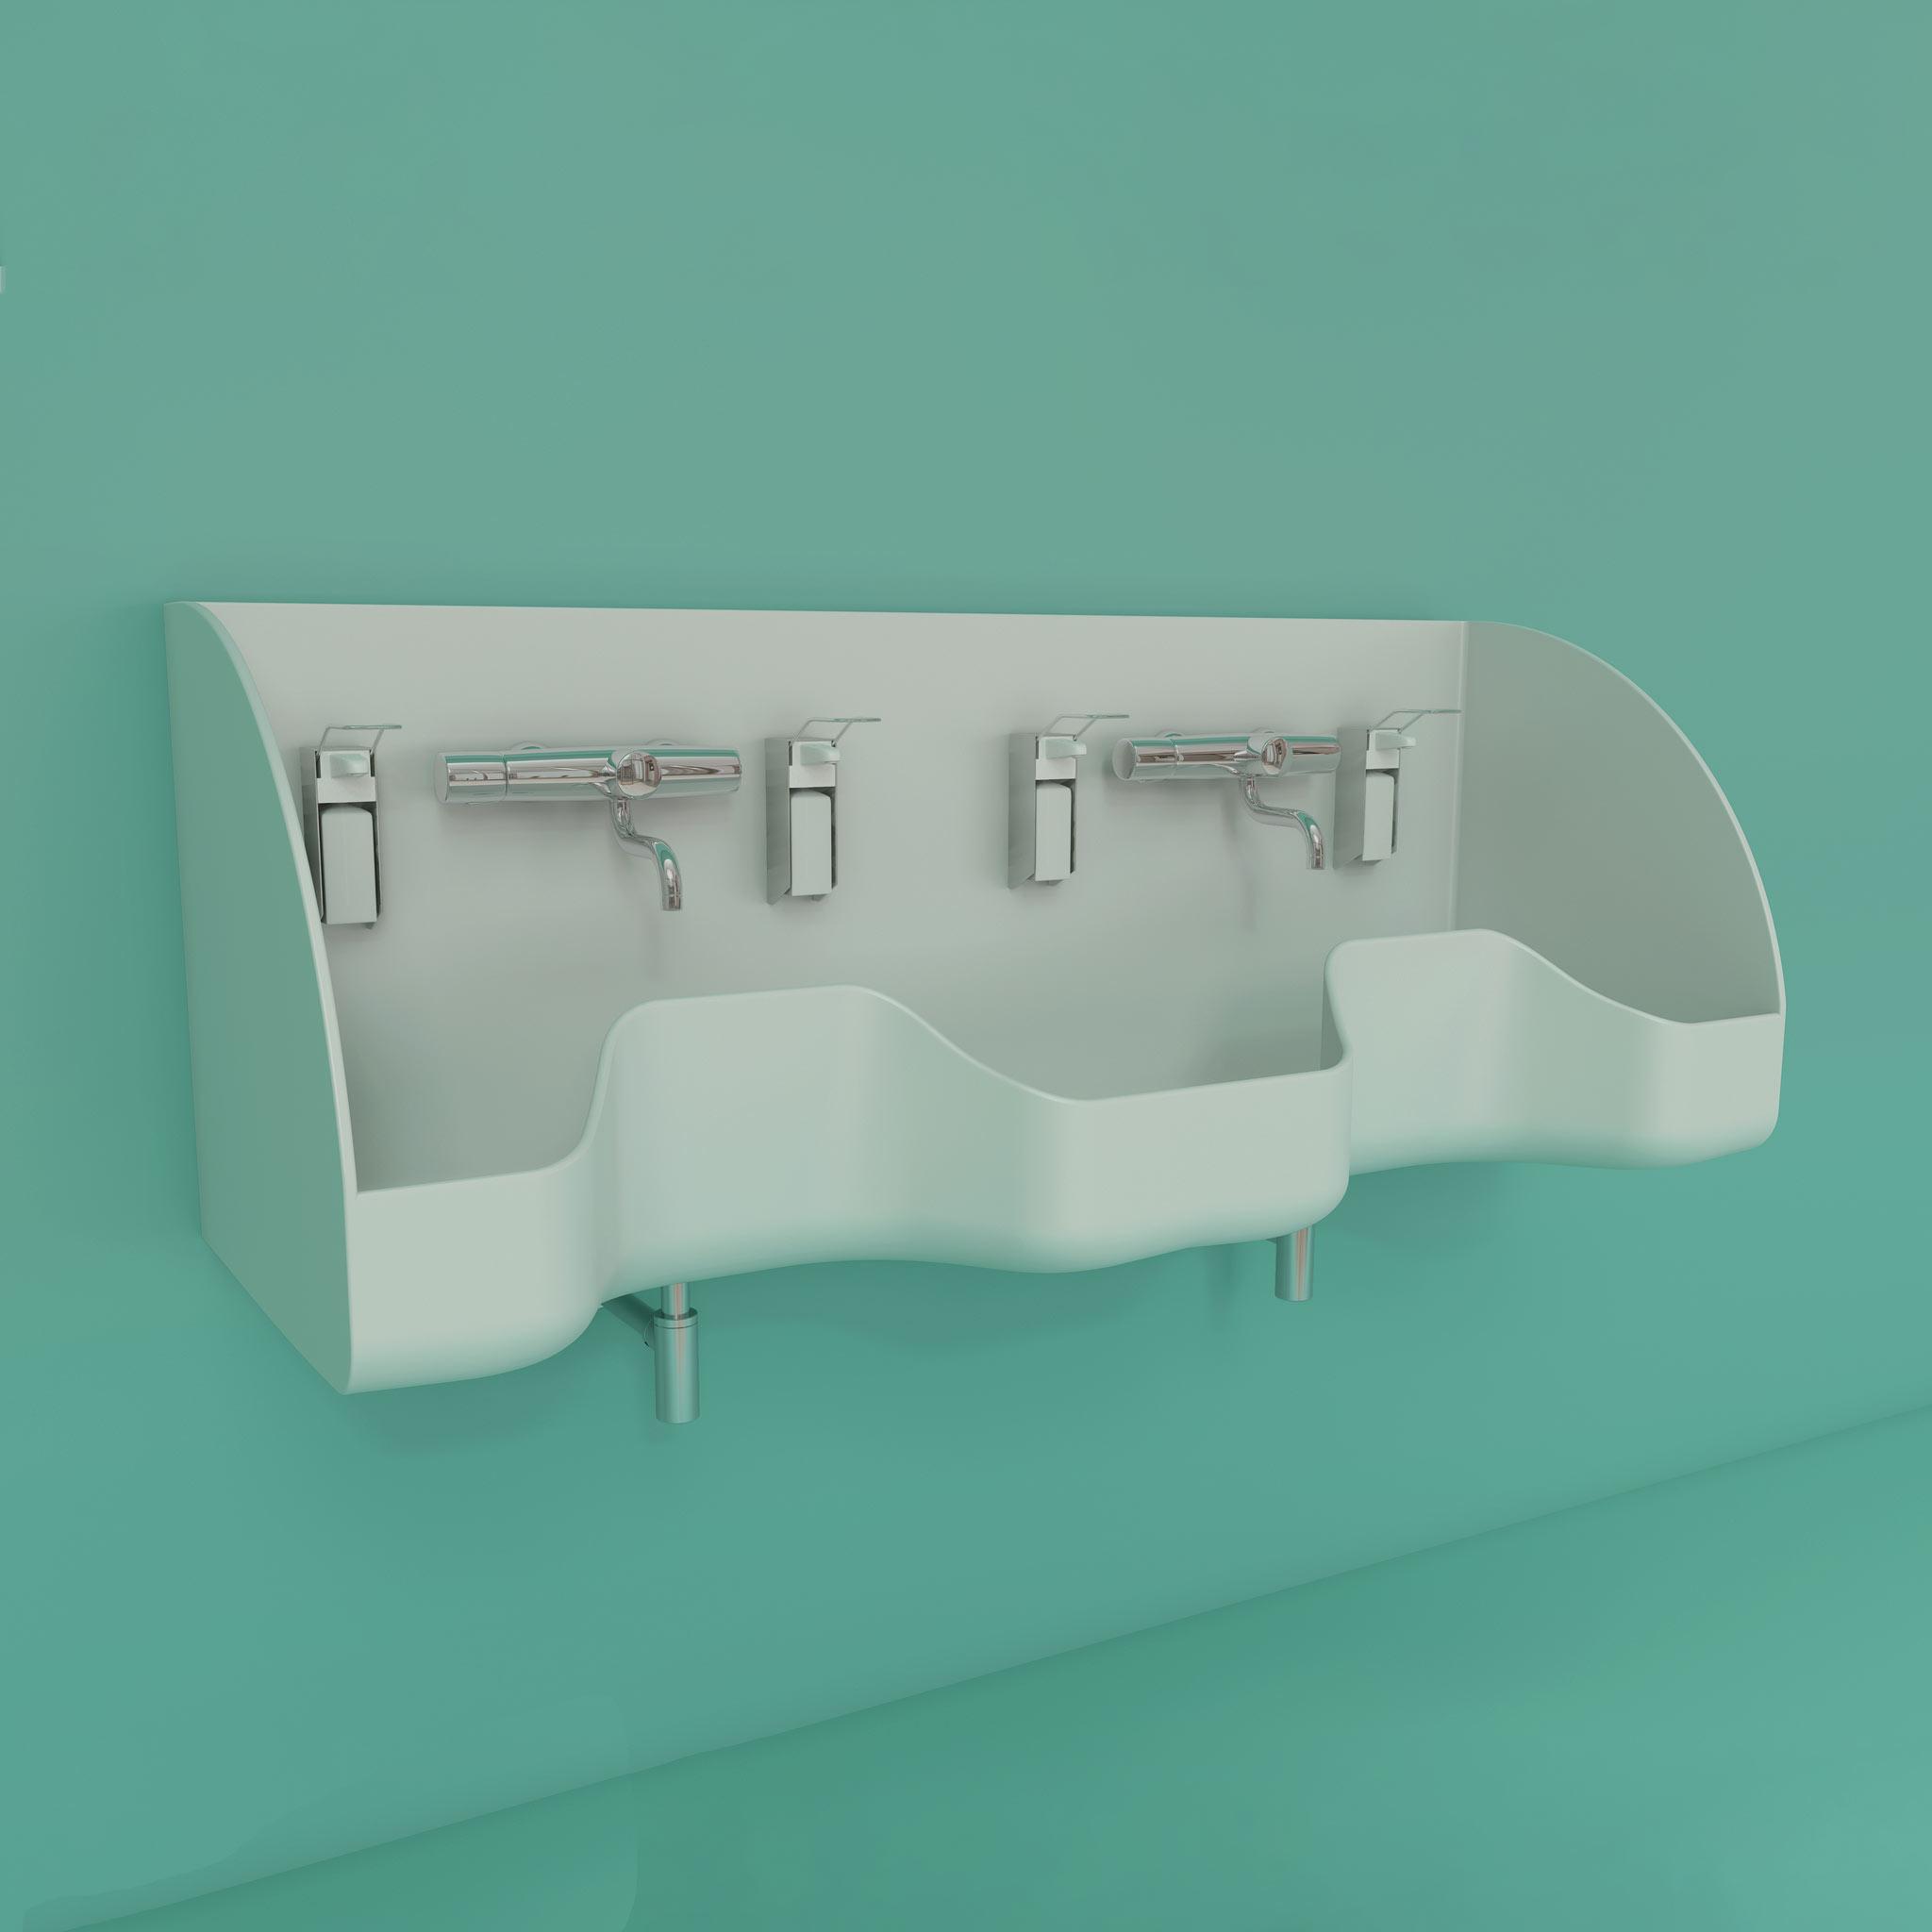 WDO series Medical double scrub sink